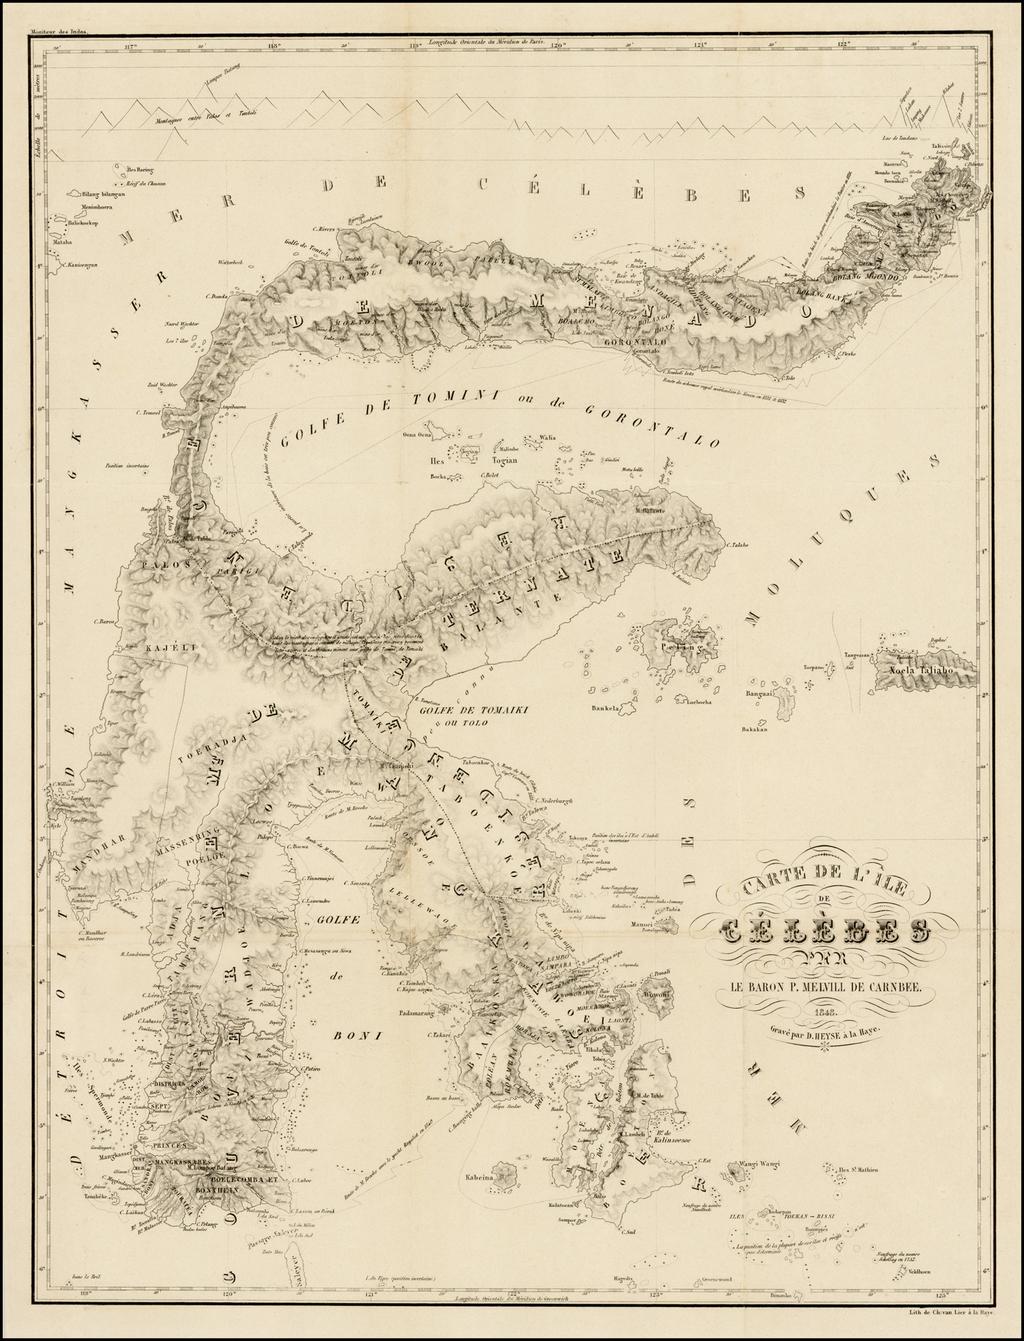 Carte de L'Ile De Celebes Par Le Baron P. Melville De Carnbee.  1848 By Pieter Baron Melvill van Carnbee